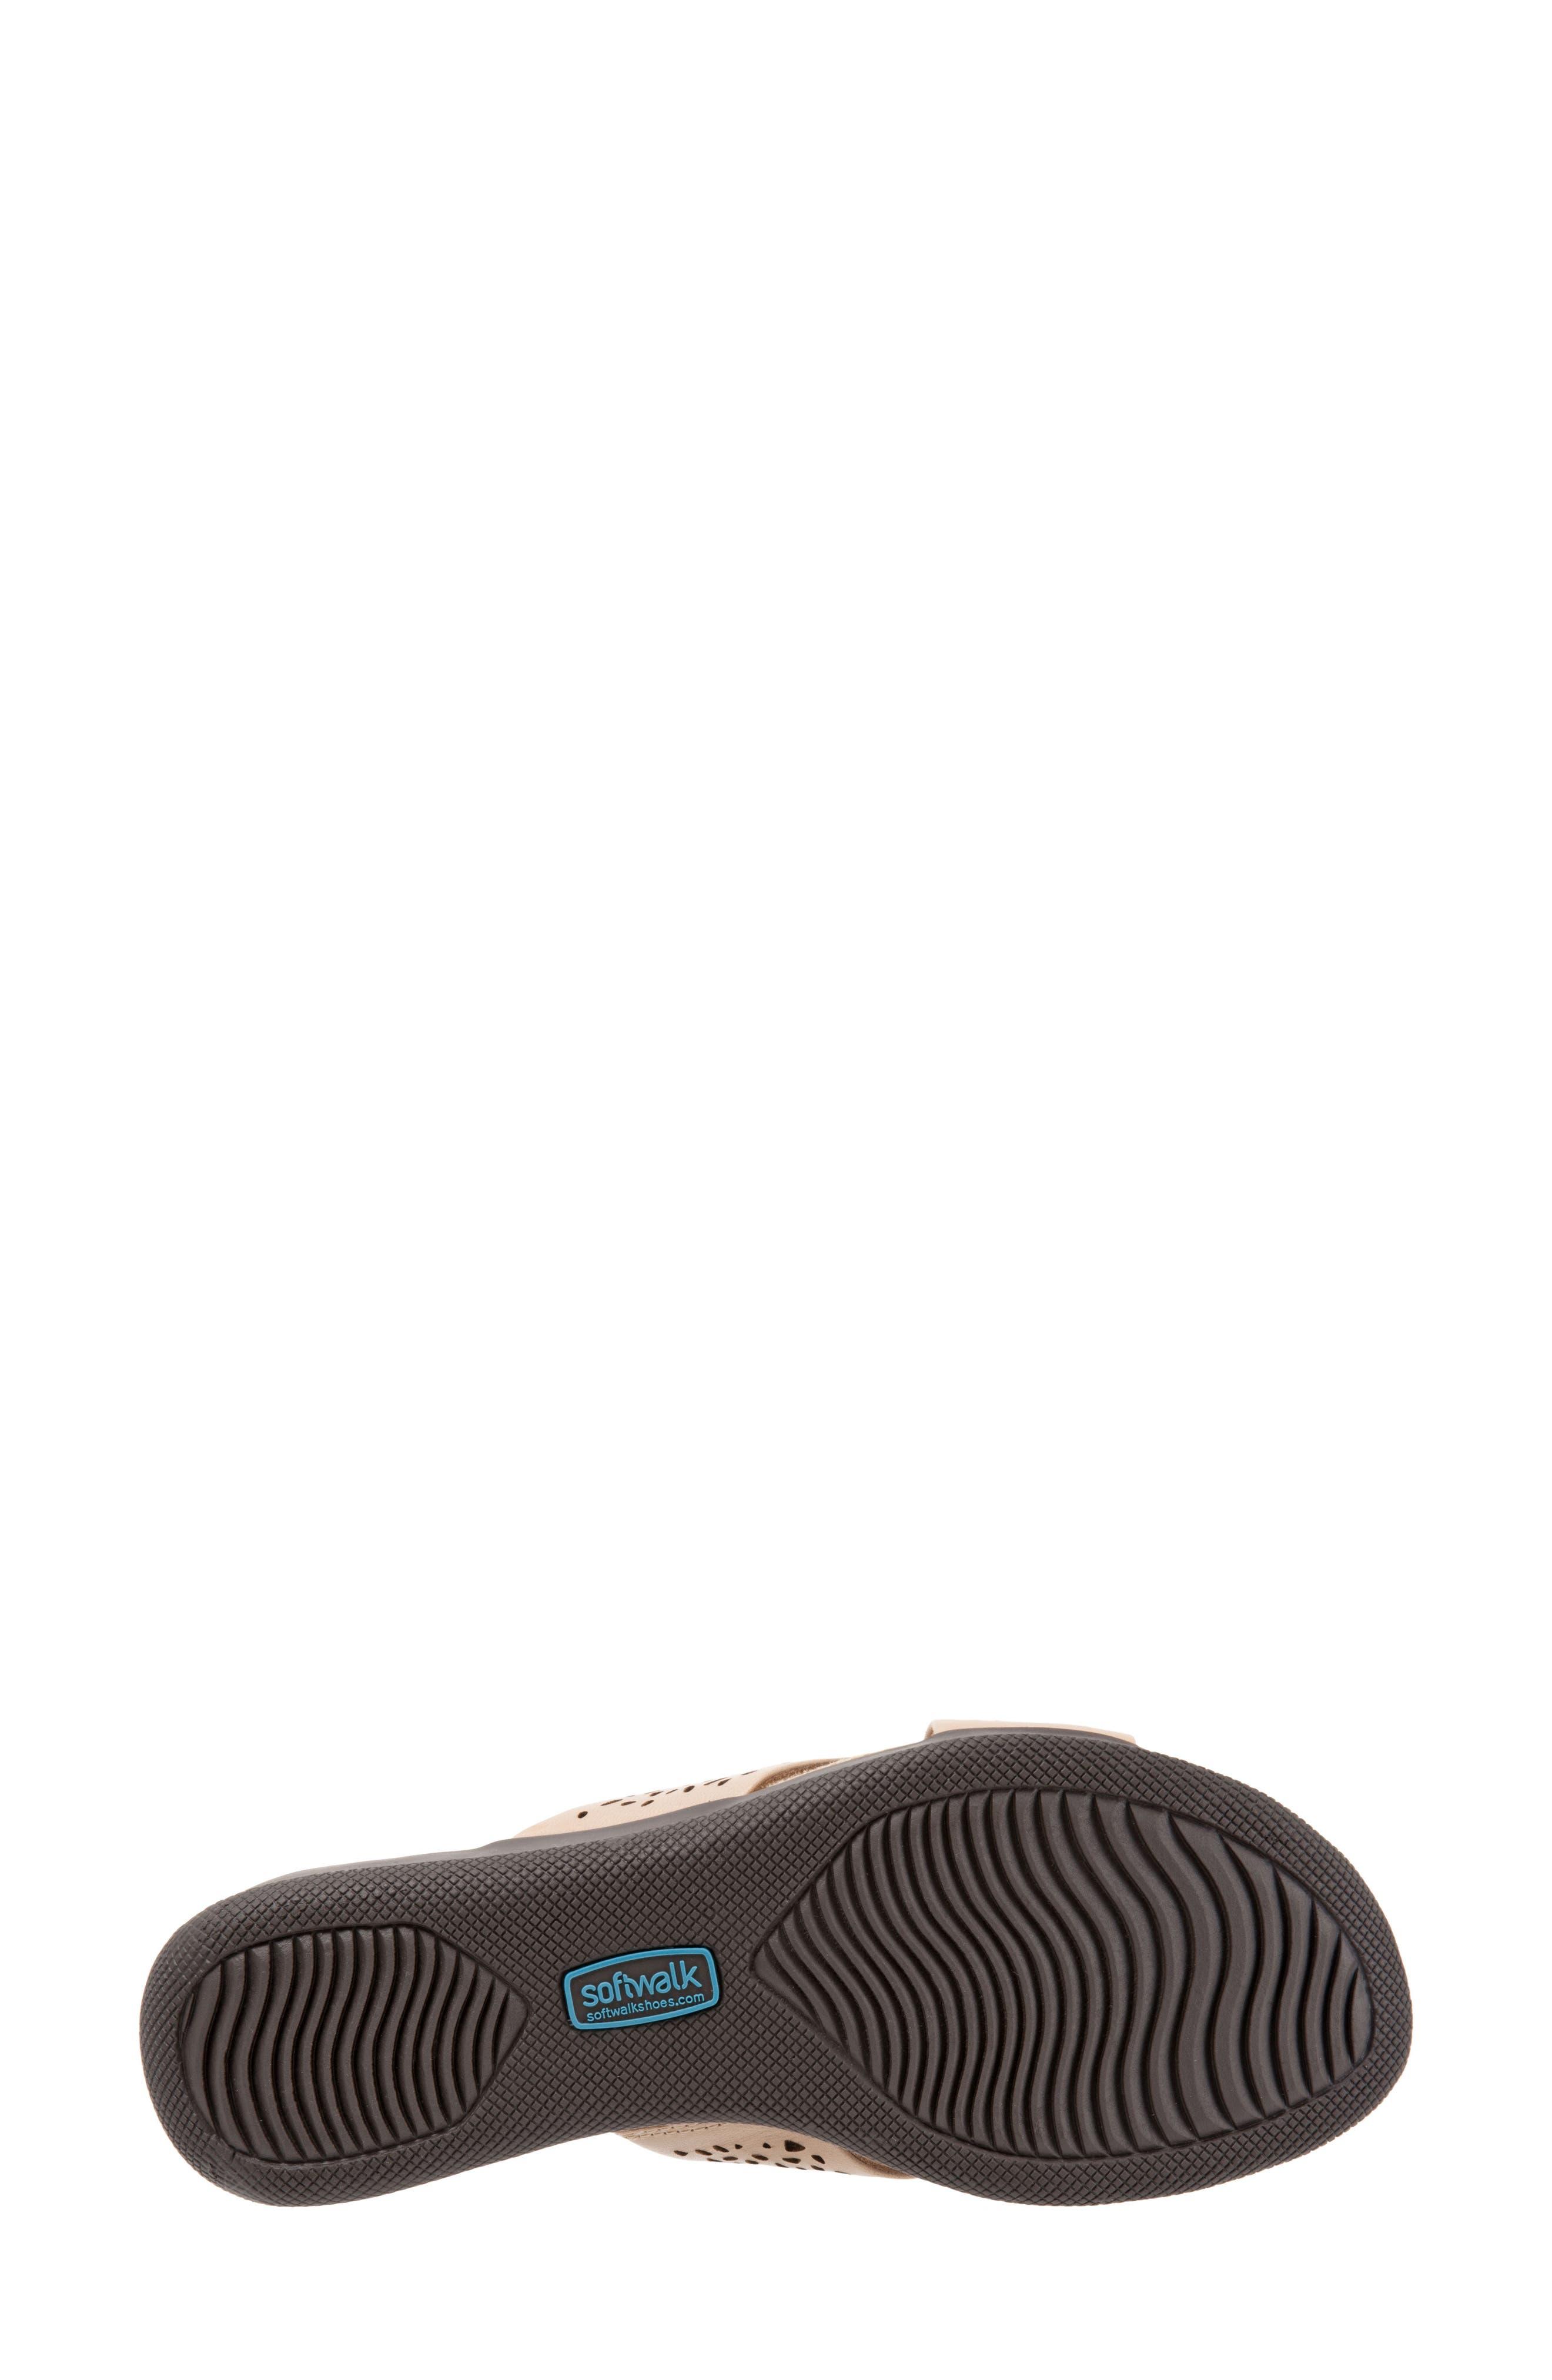 'Tillman' Leather Cross Strap Slide Sandal,                             Alternate thumbnail 6, color,                             Cement Leather